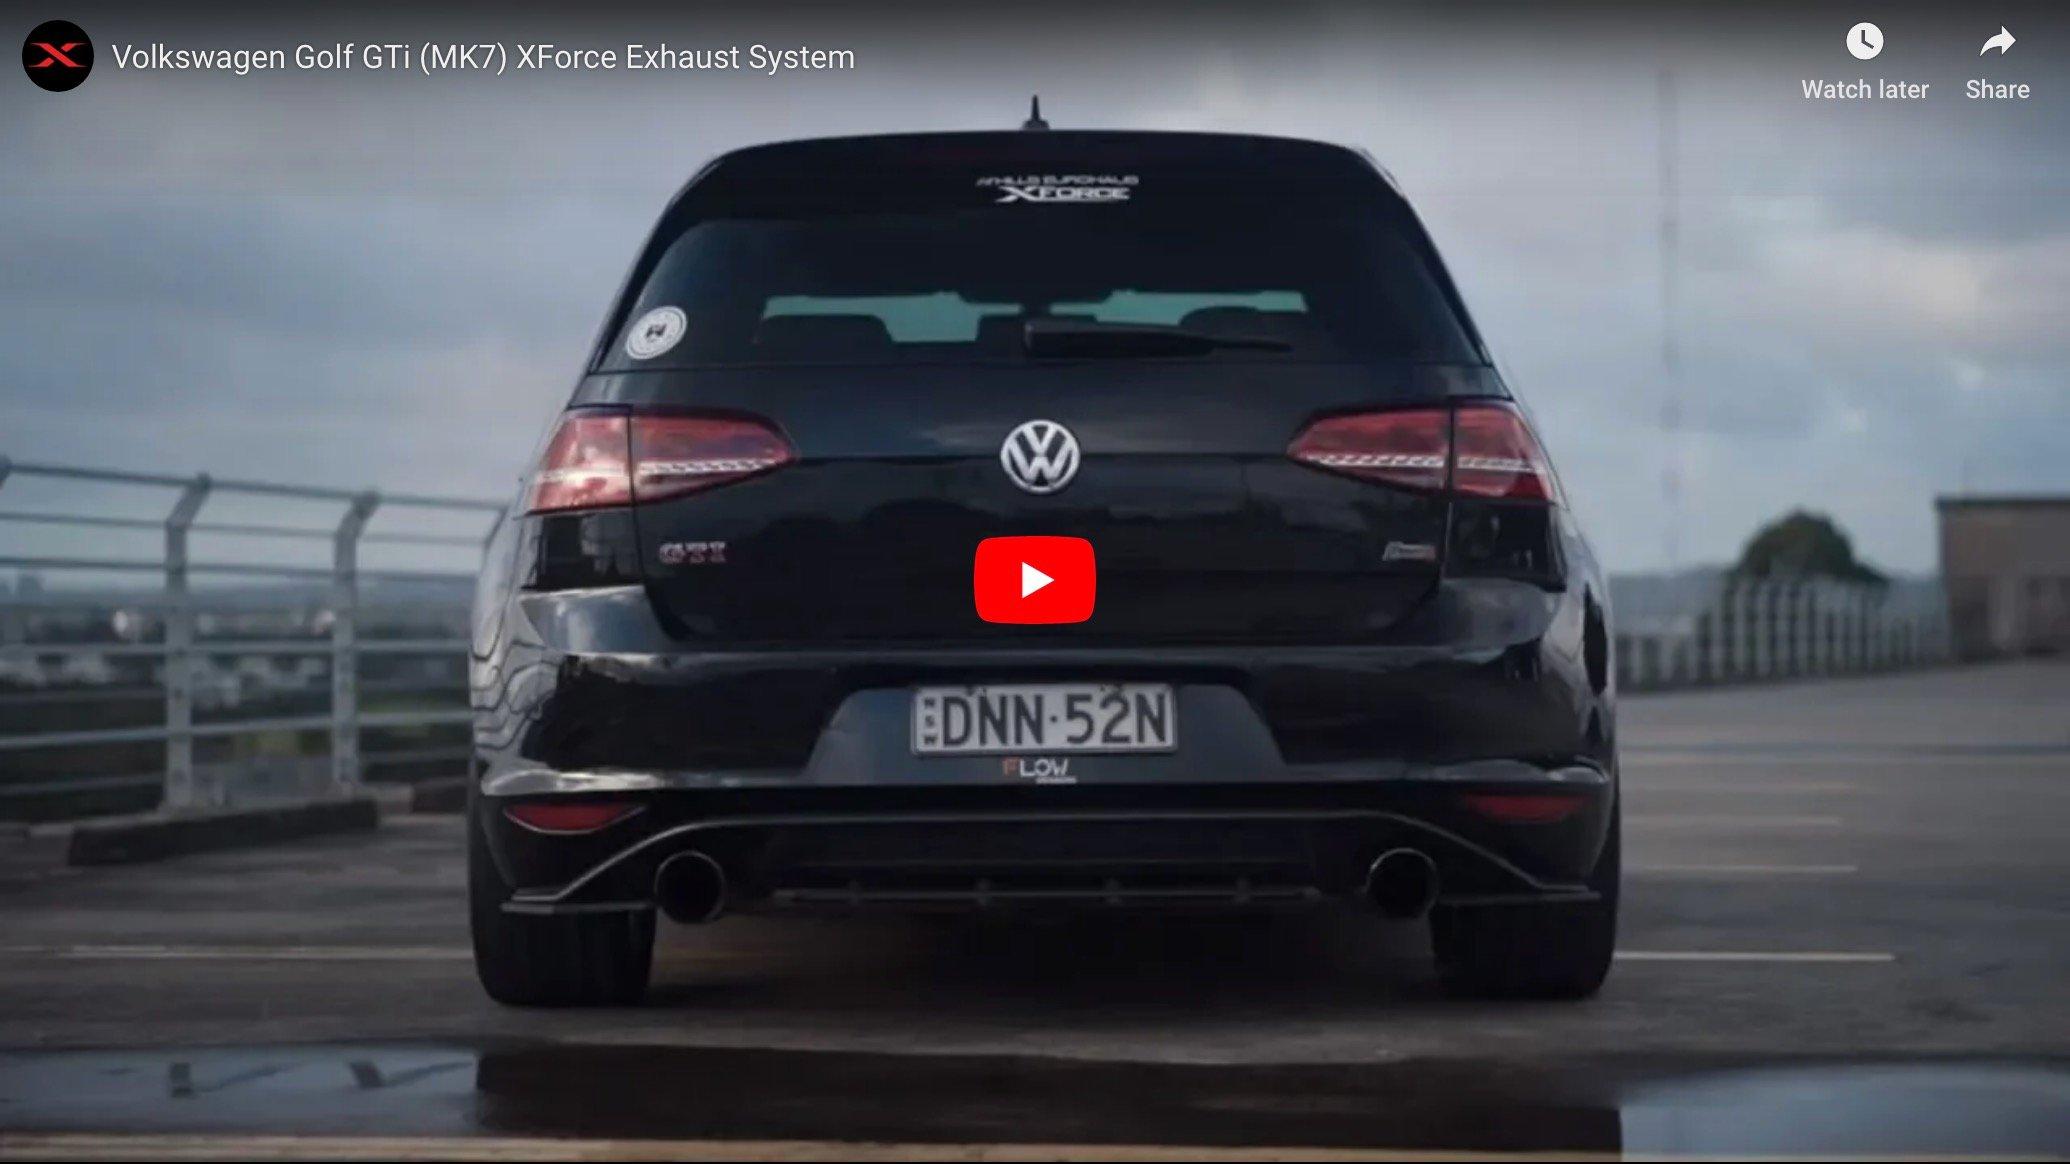 Introducing Our Volkswagen Golf Gti Mk7 Product Line Xforce Australia